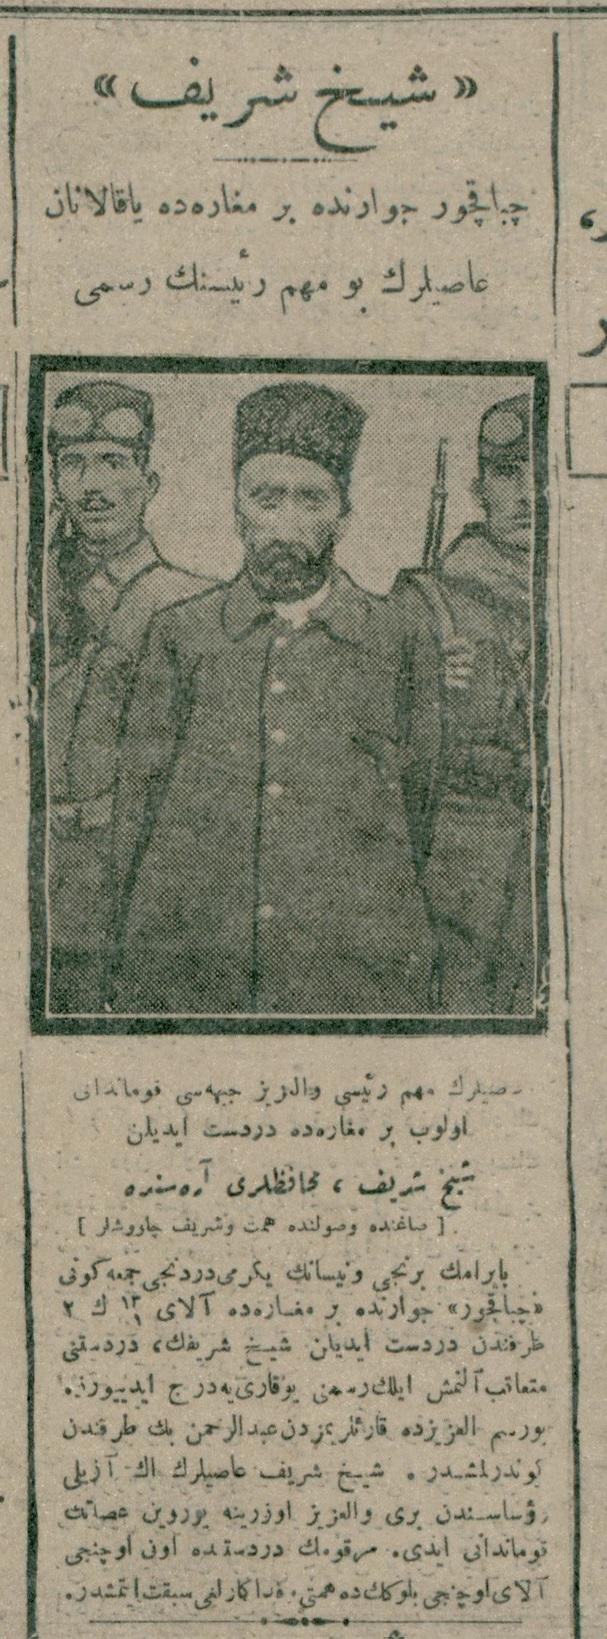 şeyx şerîf 25 mayıs 1925